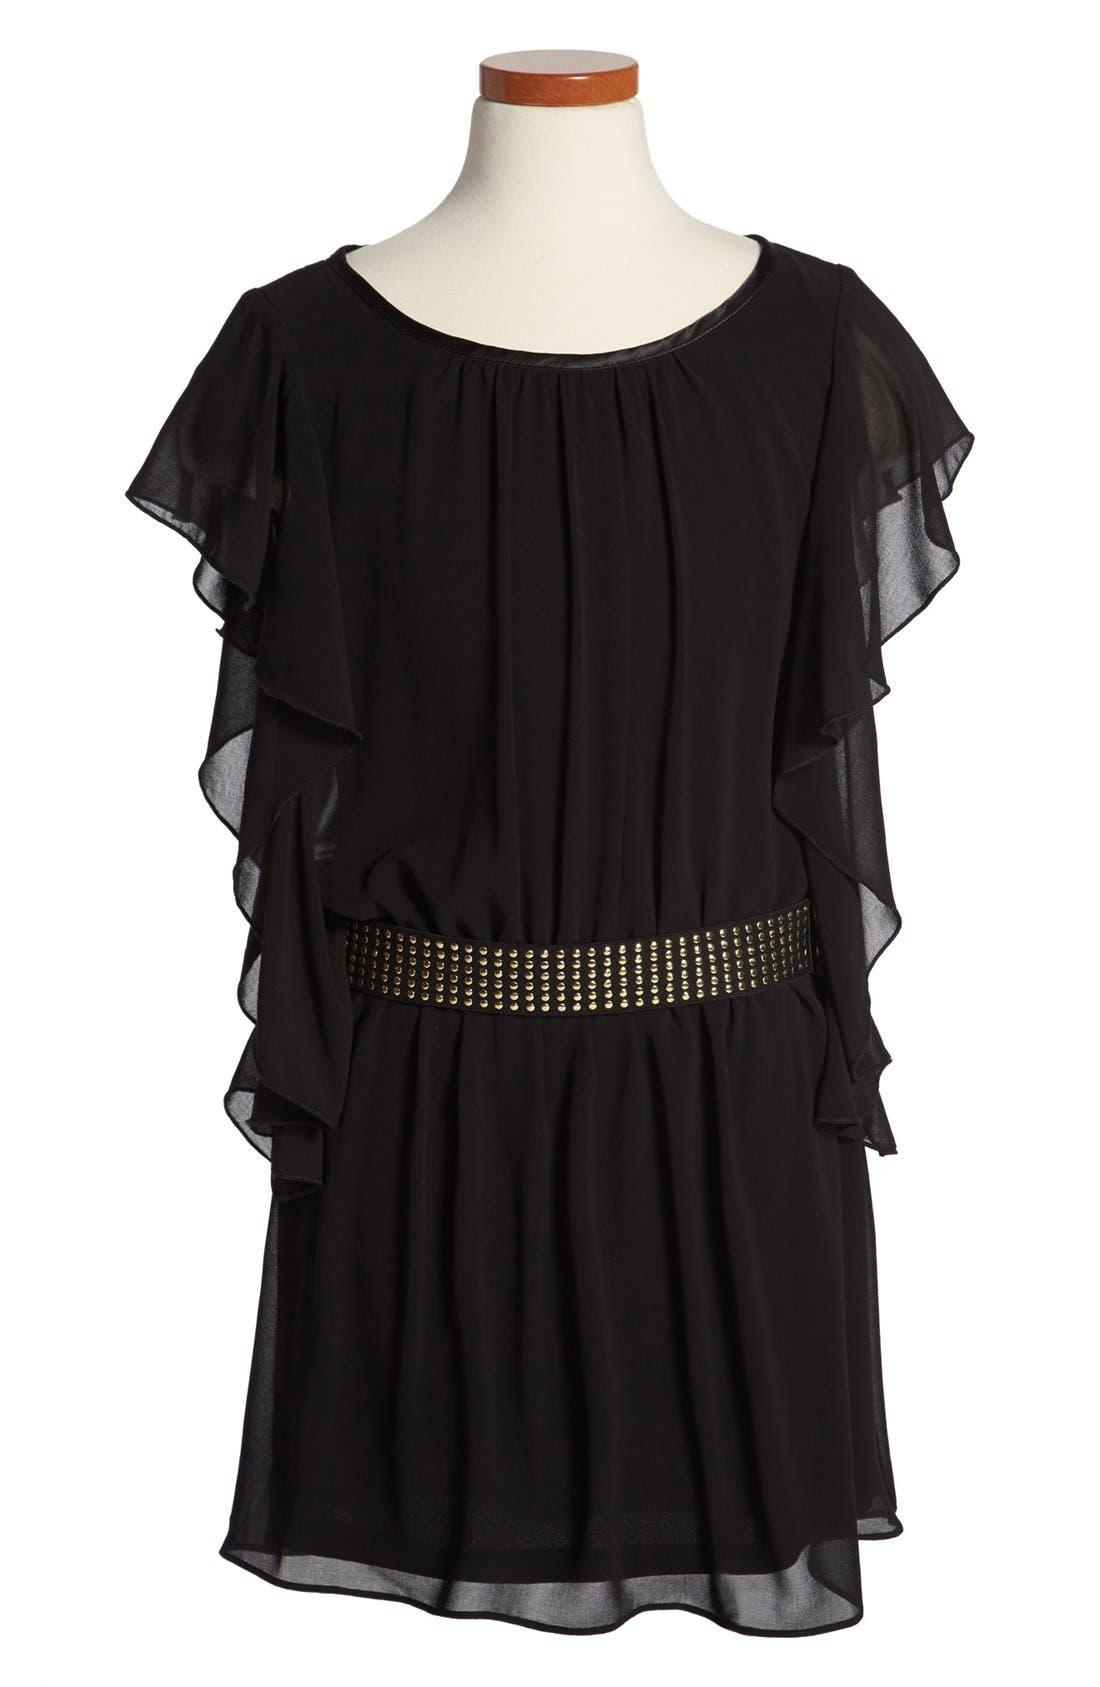 Main Image - Sally Miller Butterfly Sleeve Dress (Big Girls)